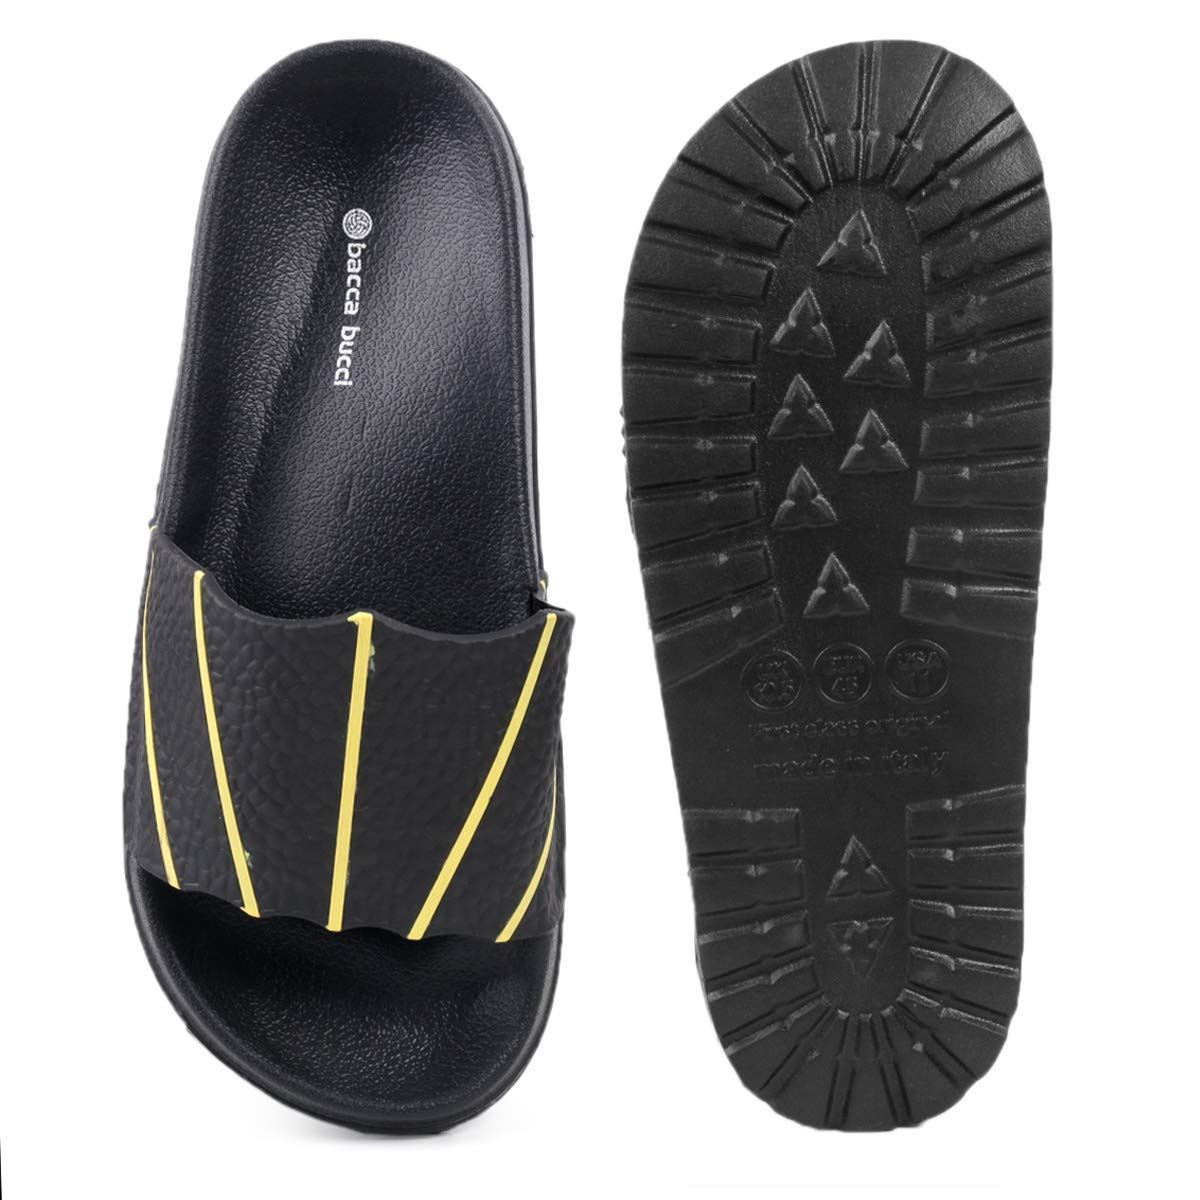 69549fa401b Bacca Bucci Men s Benassi Solarsoft Slide Athletic Sandal Beach Slippers  Slidders Lounge Slide Room wear Flip Flops  Buy Online at Low Prices in  India ...